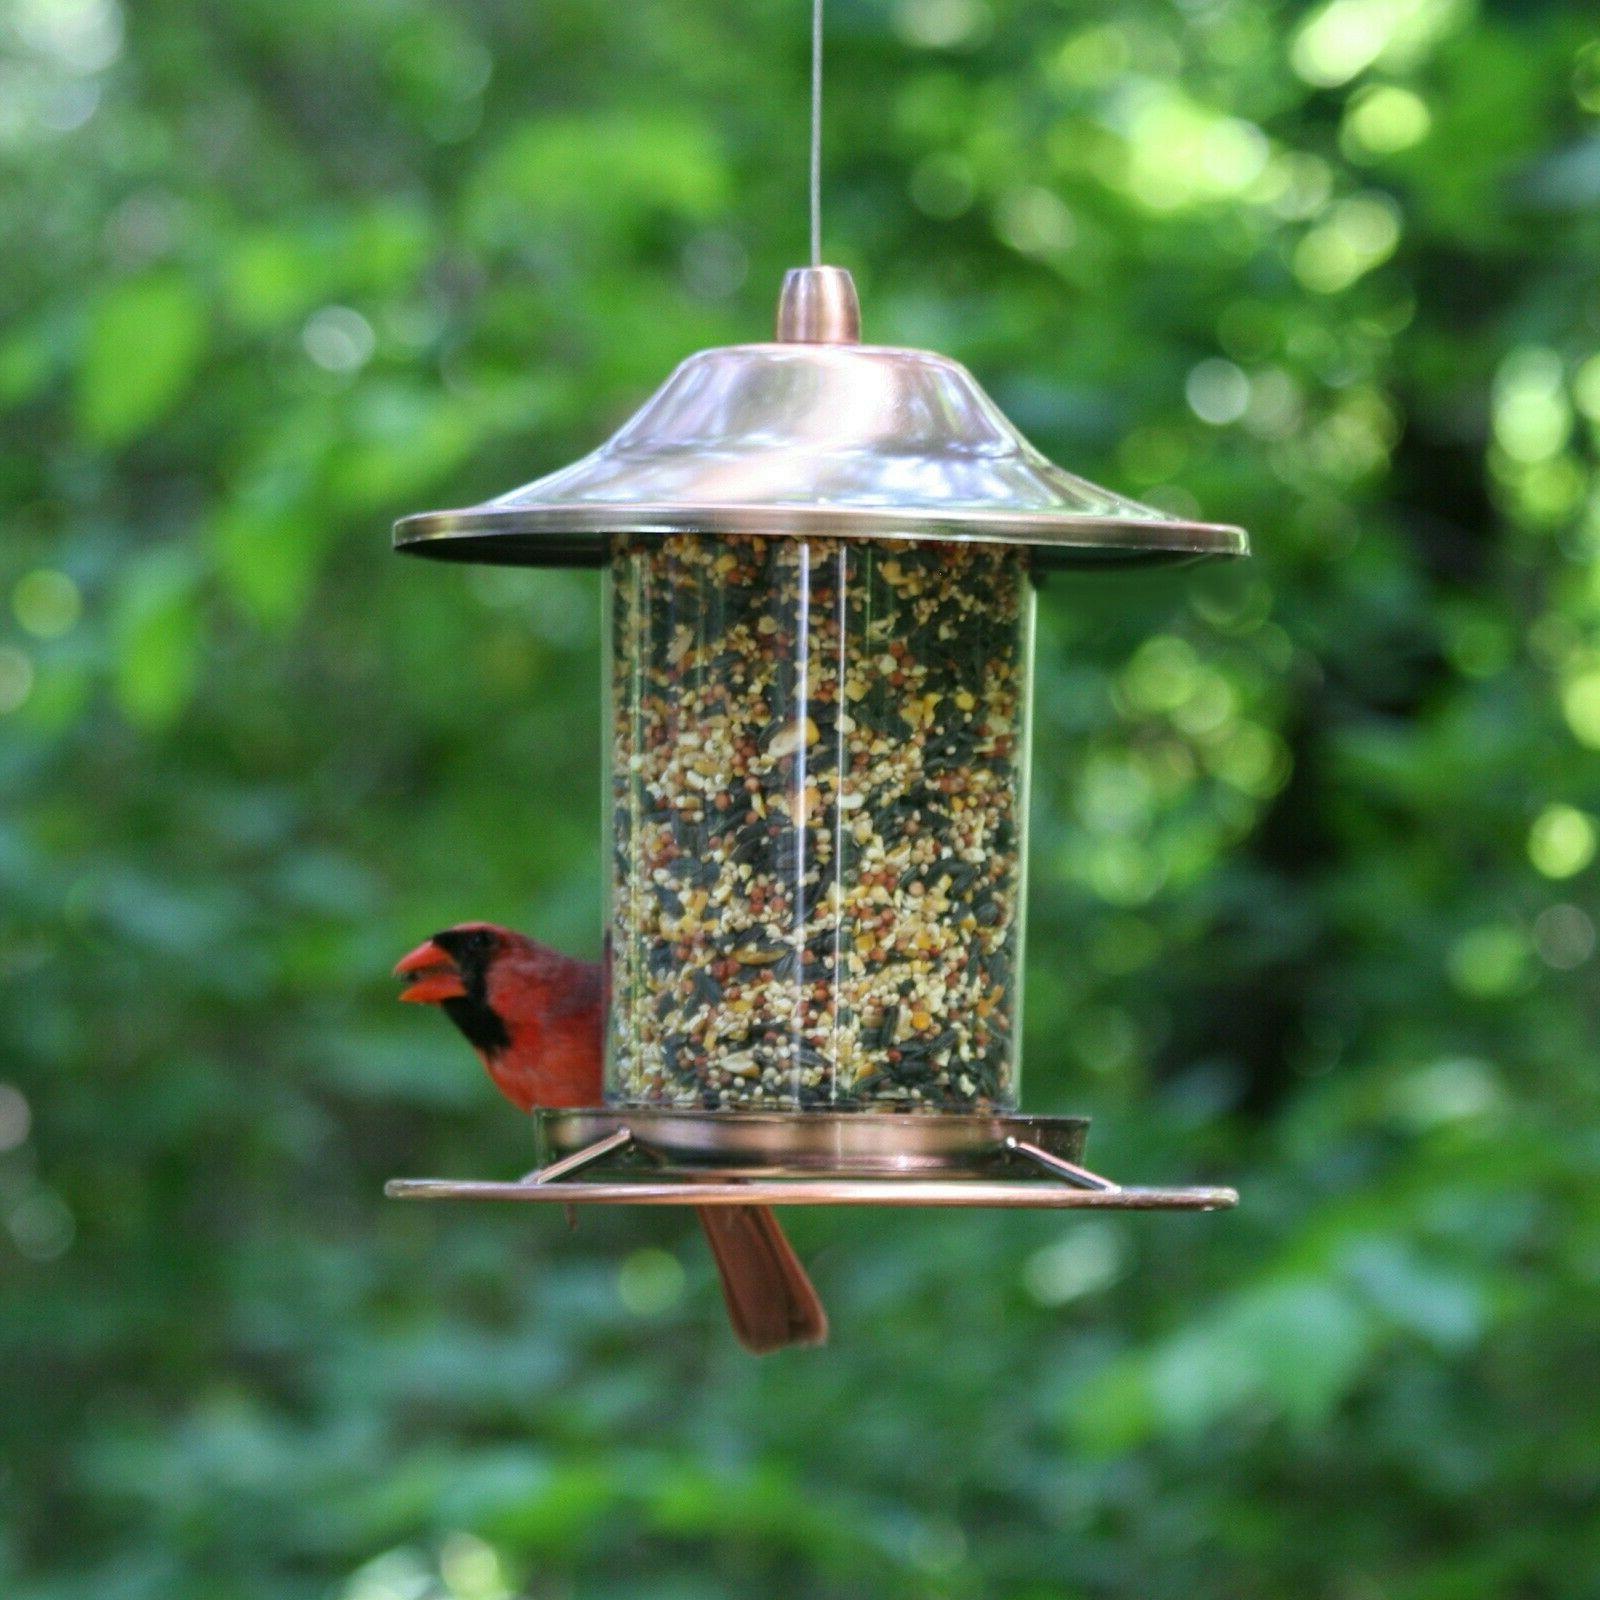 2 Lb Feeder Garden Feed Dispenser Birdfeeder Perch